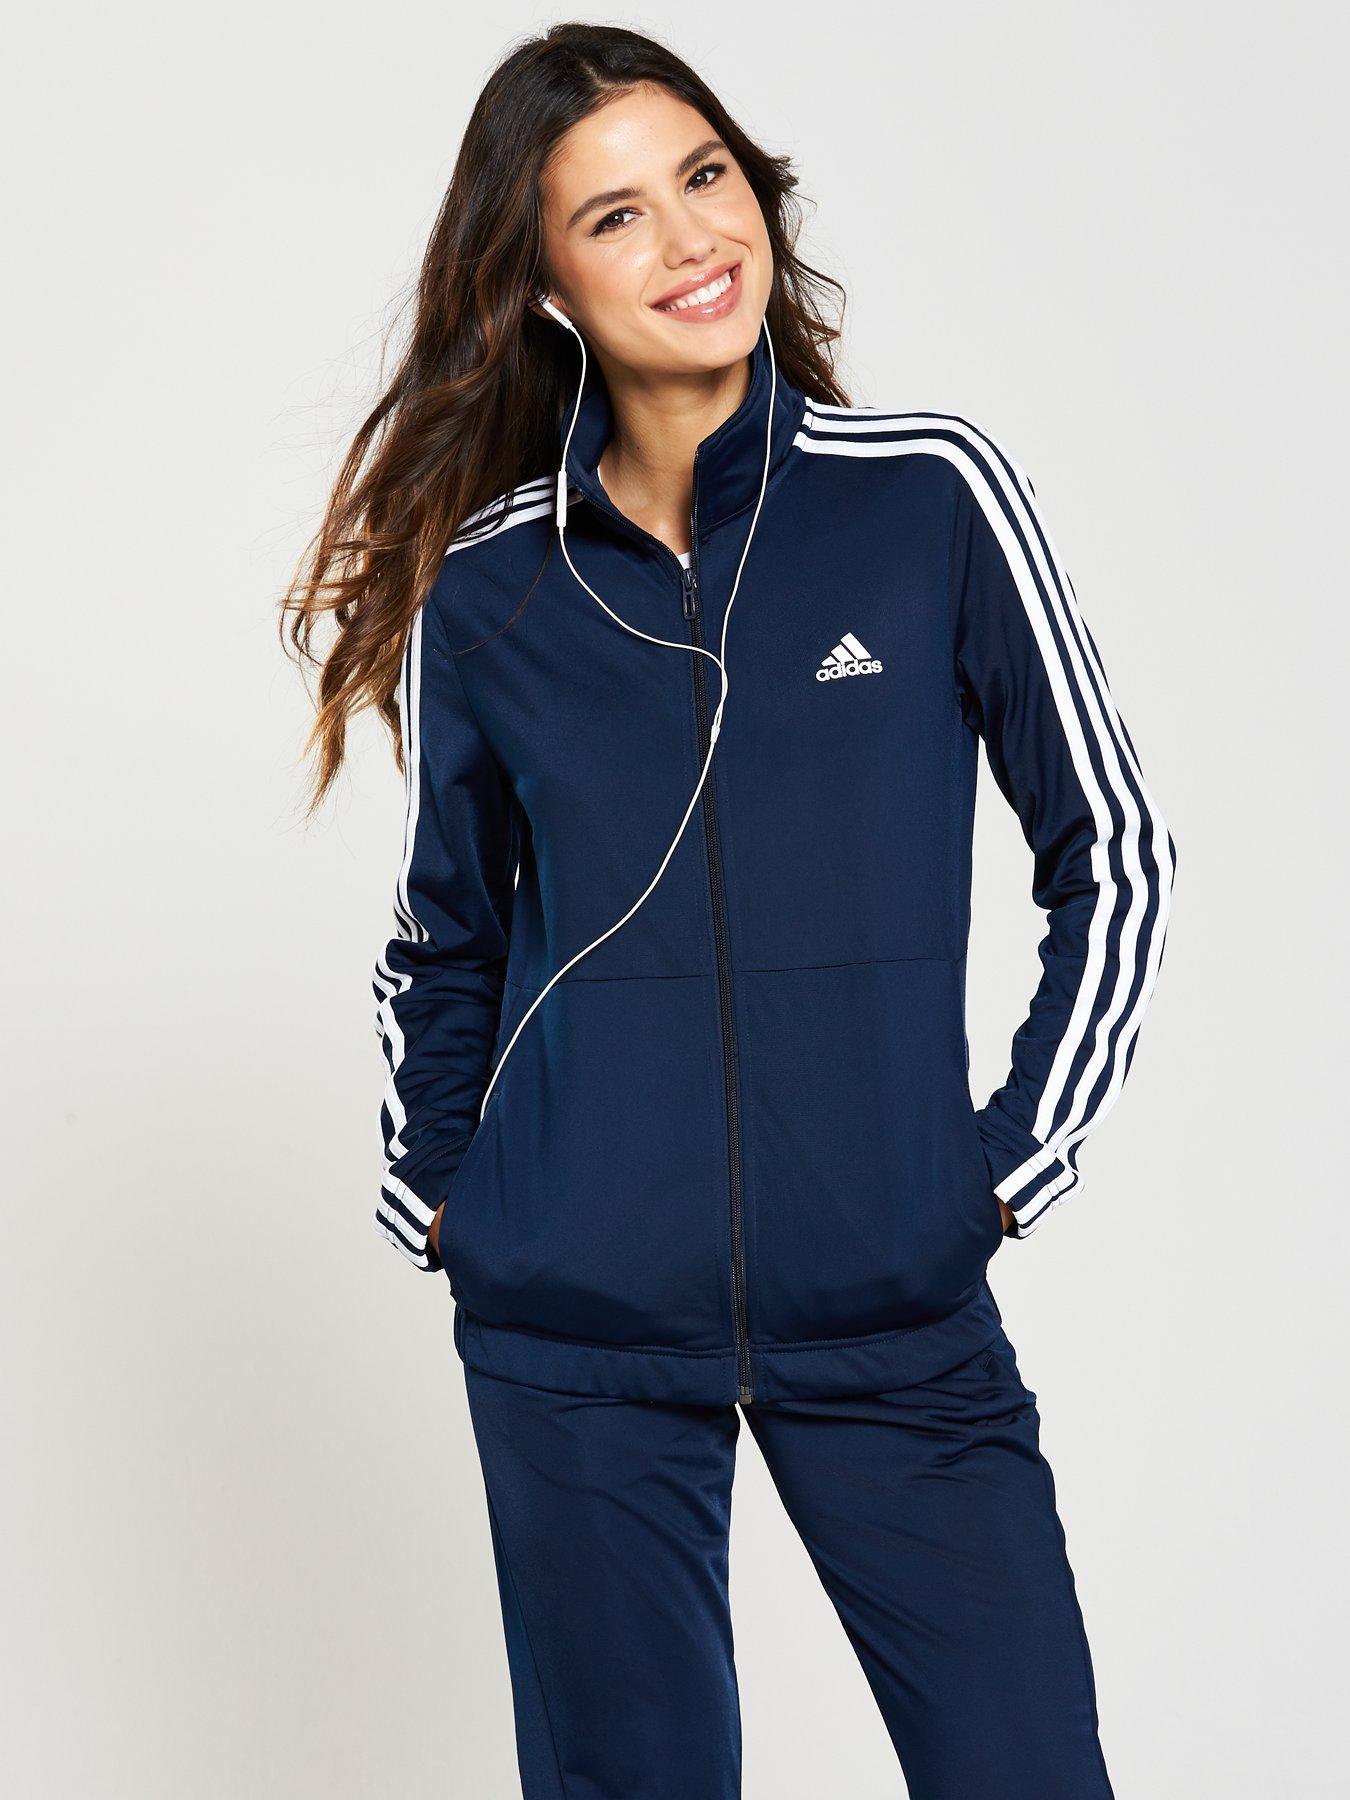 246e3feb54c adidas tracksuit womens adidas back 2 basics 3 stripe tracksuitnbsp